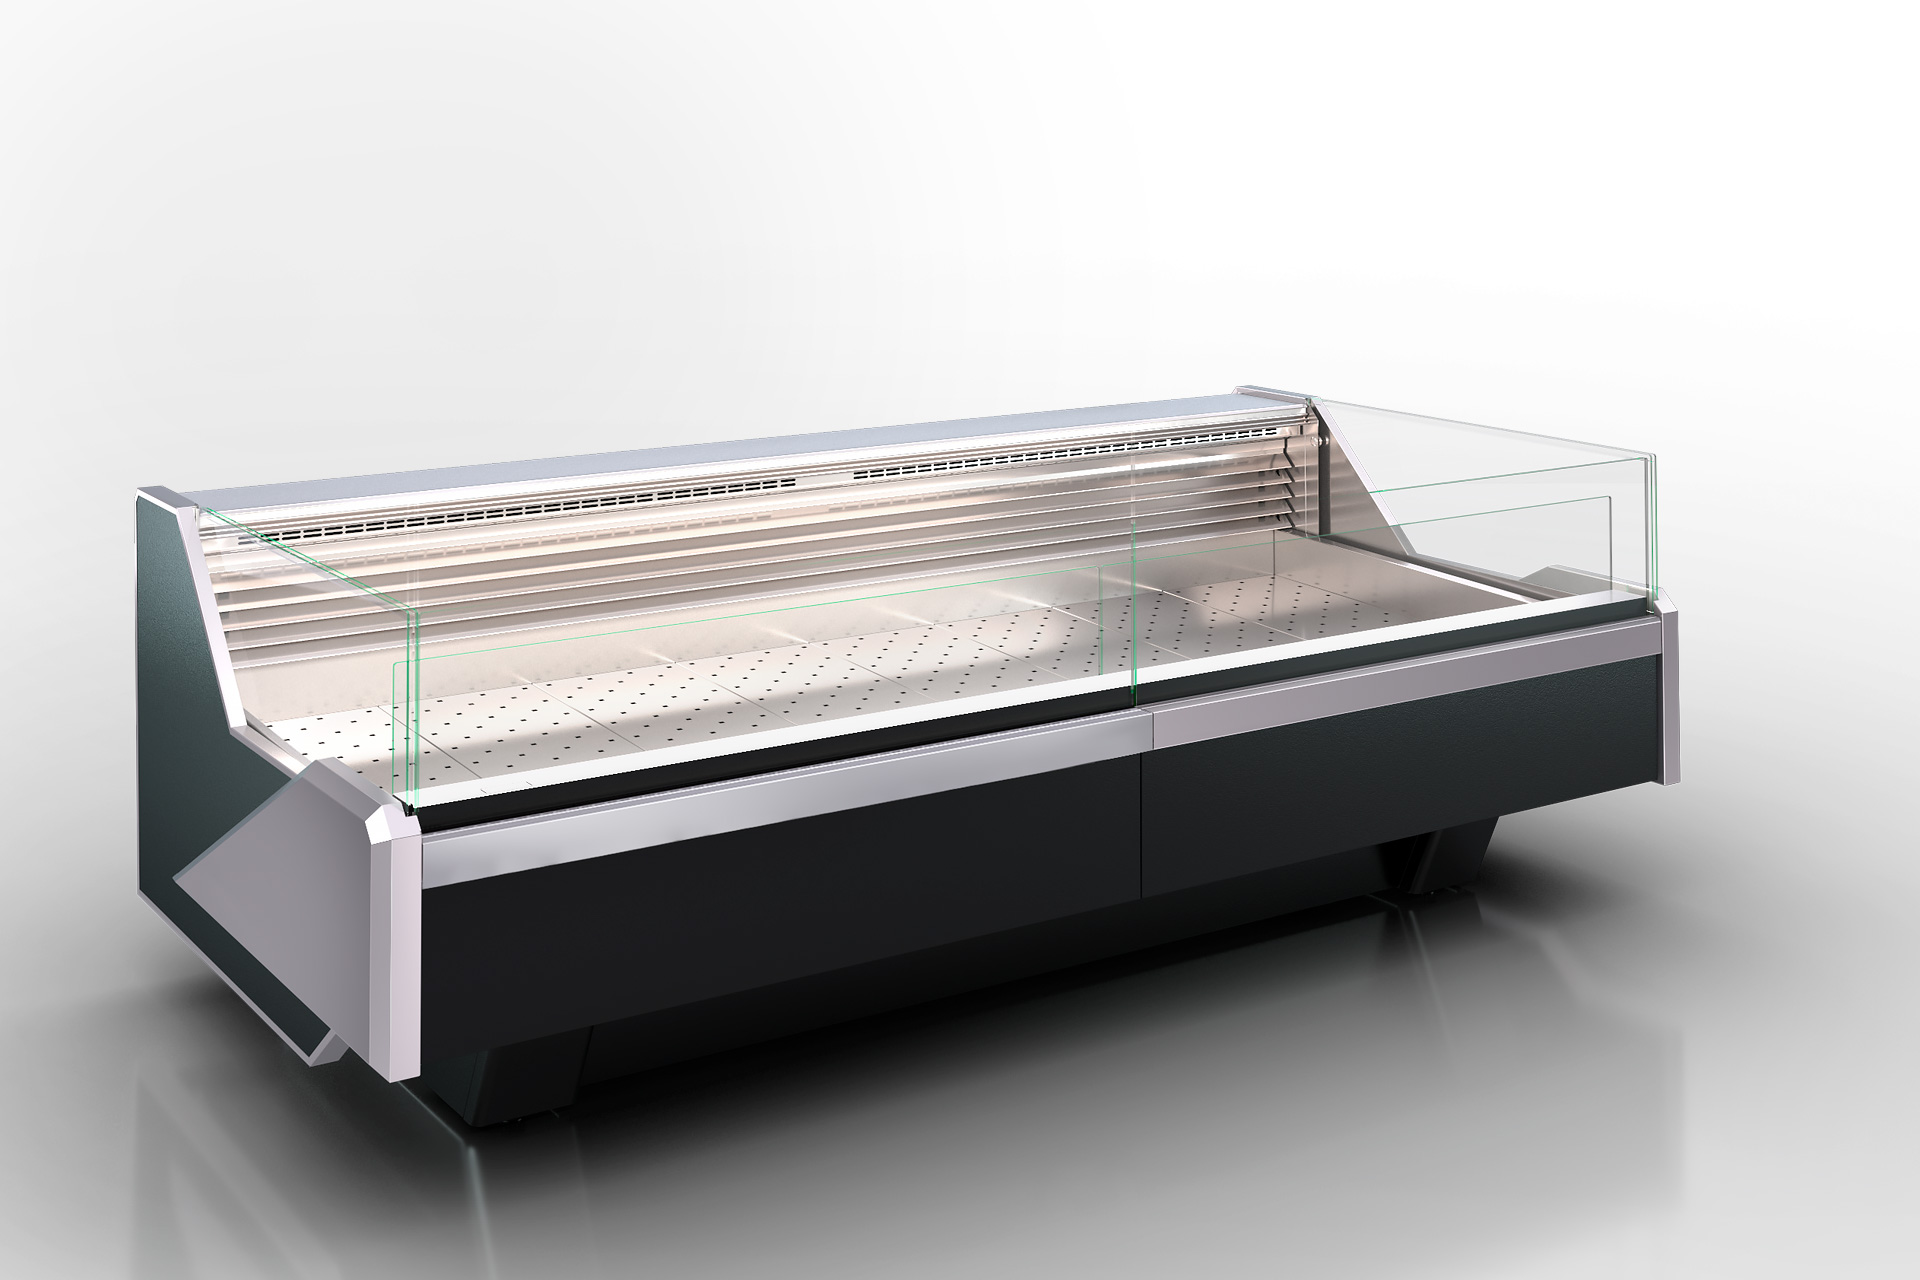 Refrigerated counters Missouri enigma MC 122 fish self 084-SPLM/SPLA